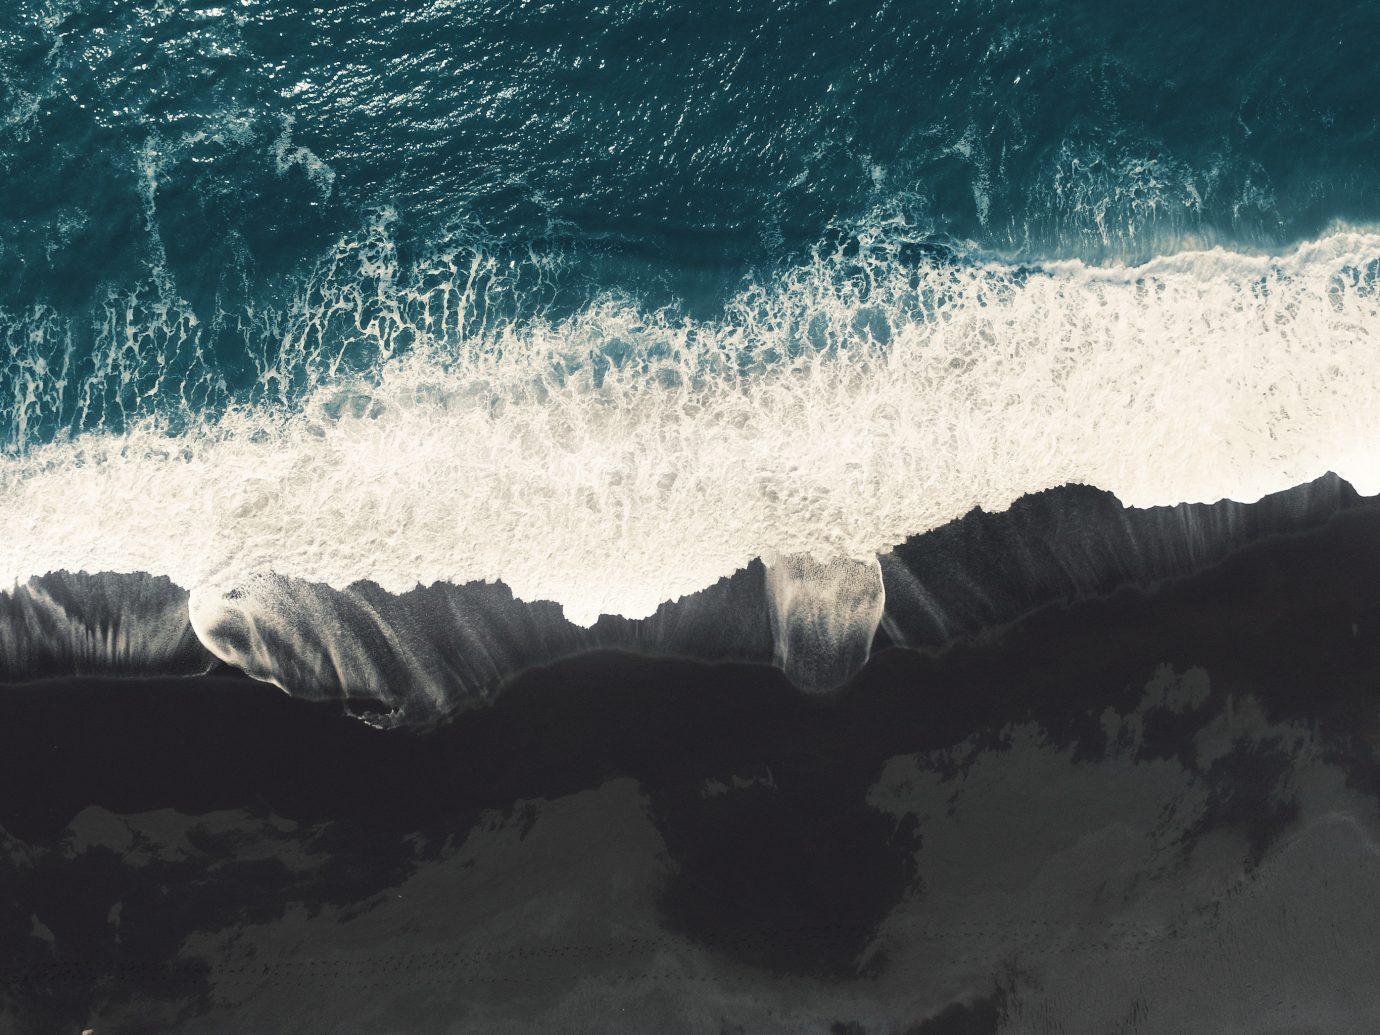 Iceland Offbeat Outdoors + Adventure outdoor water sport wave atmospheric phenomenon wind wave water Ocean weather Sea geological phenomenon horizon surfing cloud reflection sunlight Coast terrain wind snow